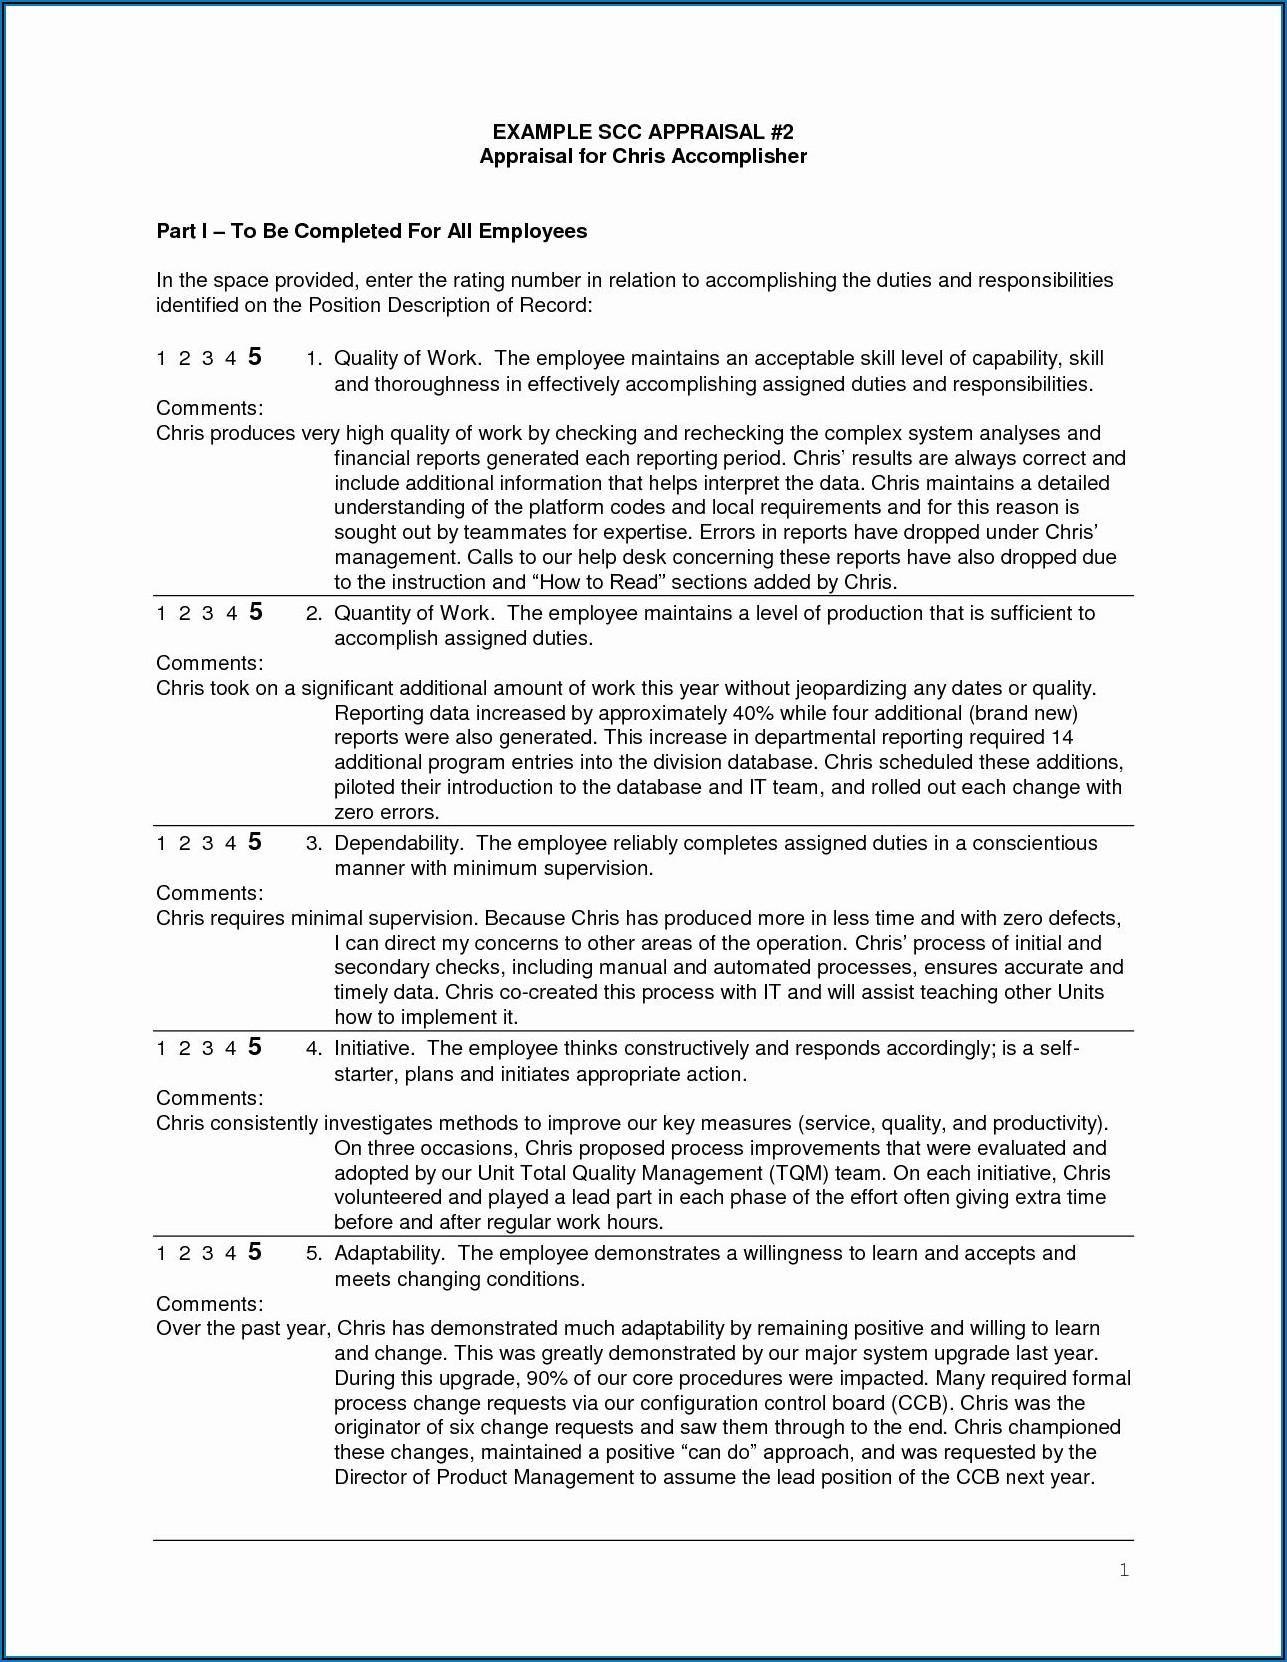 Performance Appraisal Sample Wording For Employees